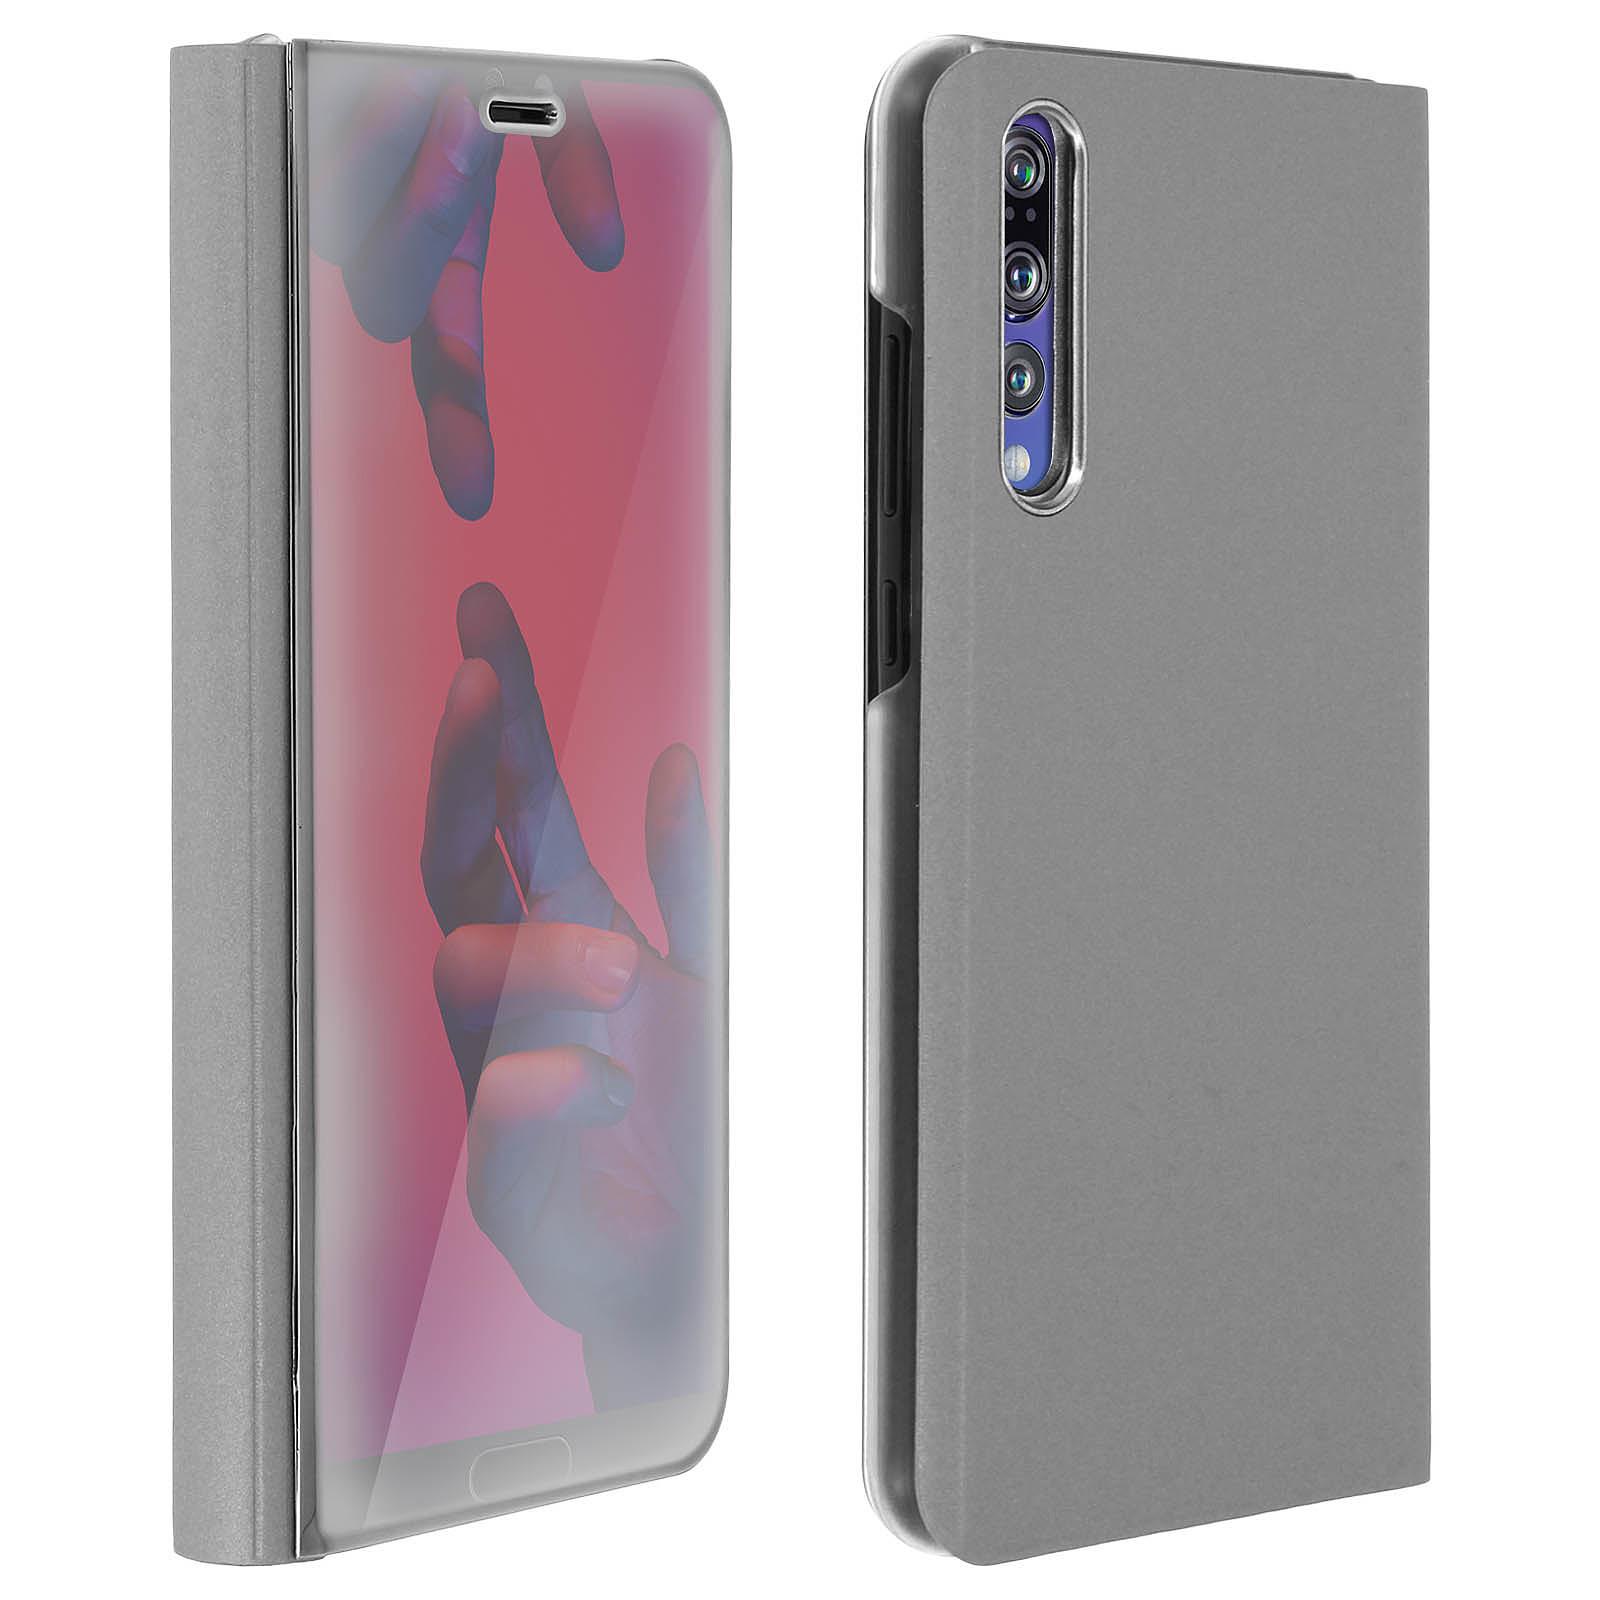 Avizar Etui folio Argent pour Huawei P20 Pro